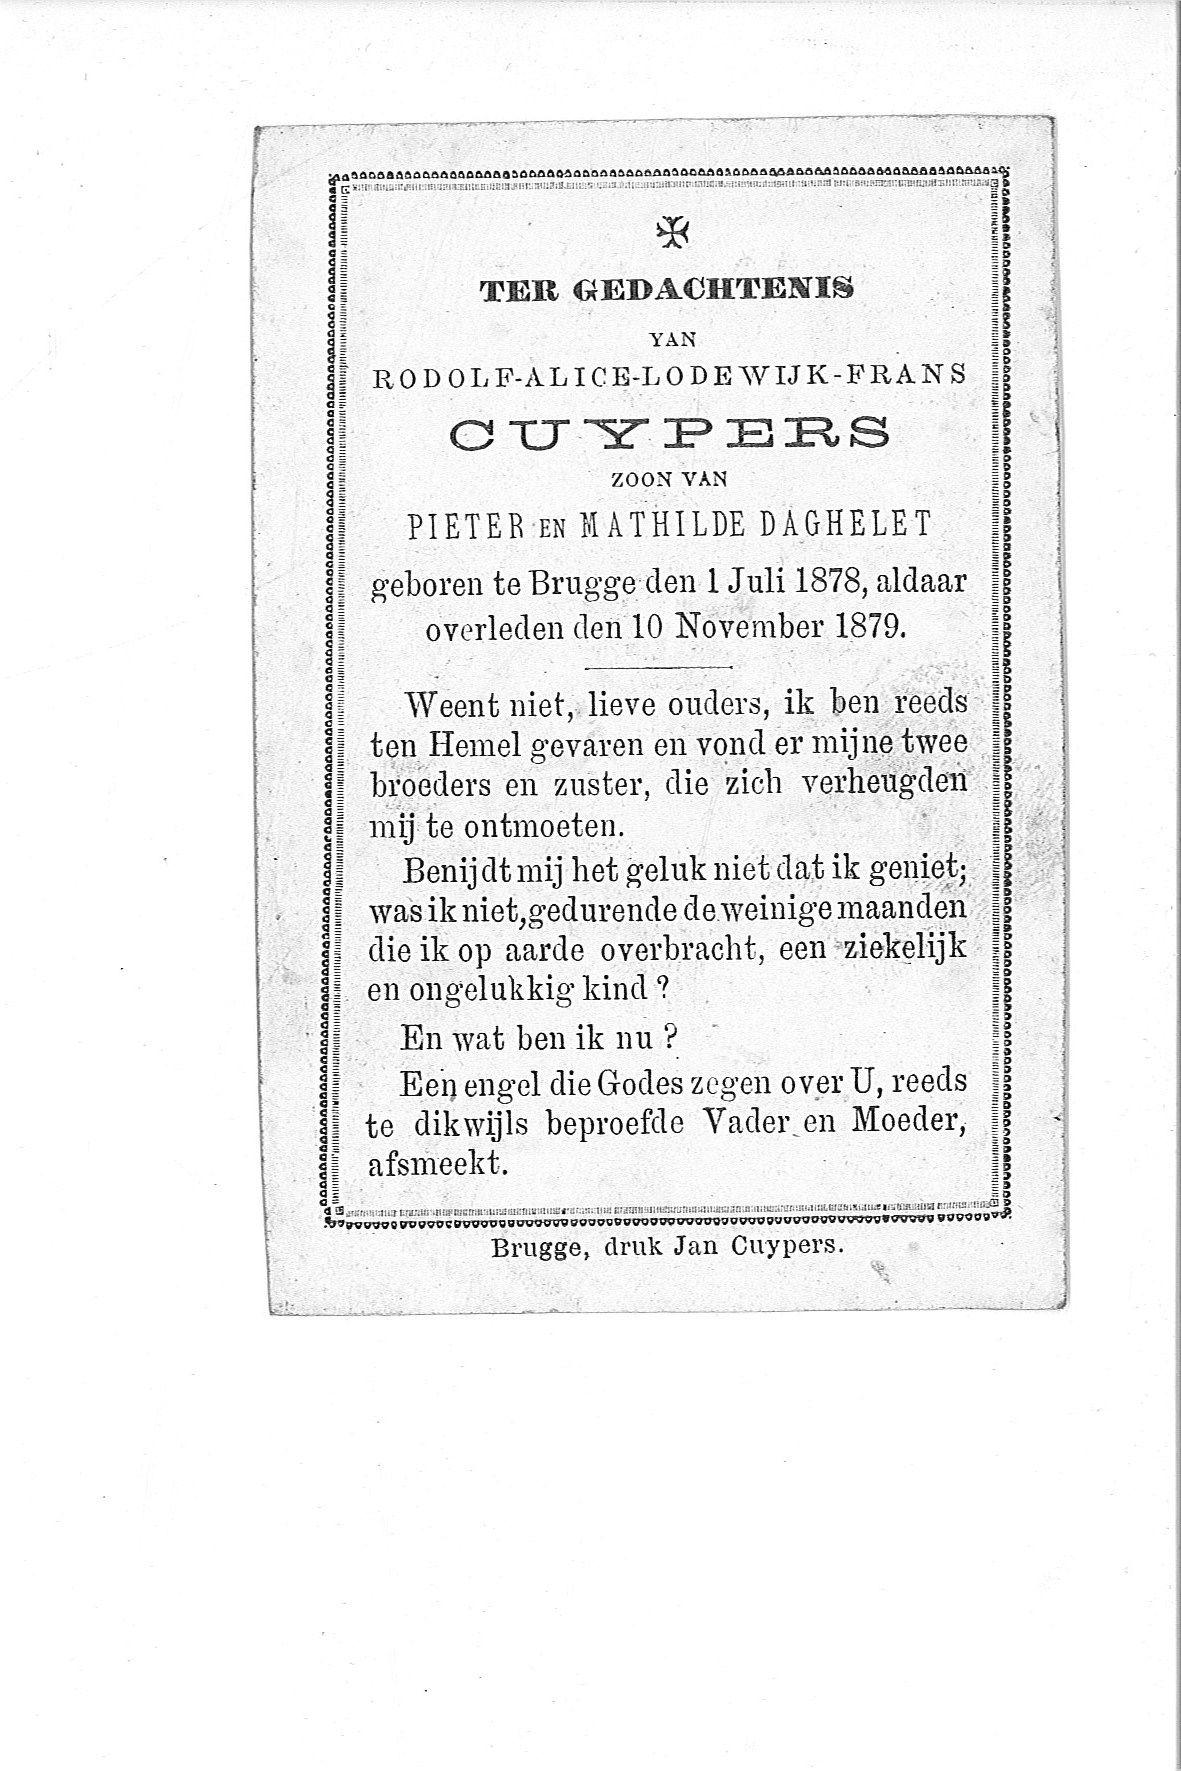 rodolf-alice-lodewijk-frans(1879)20090323101150_00046.jpg